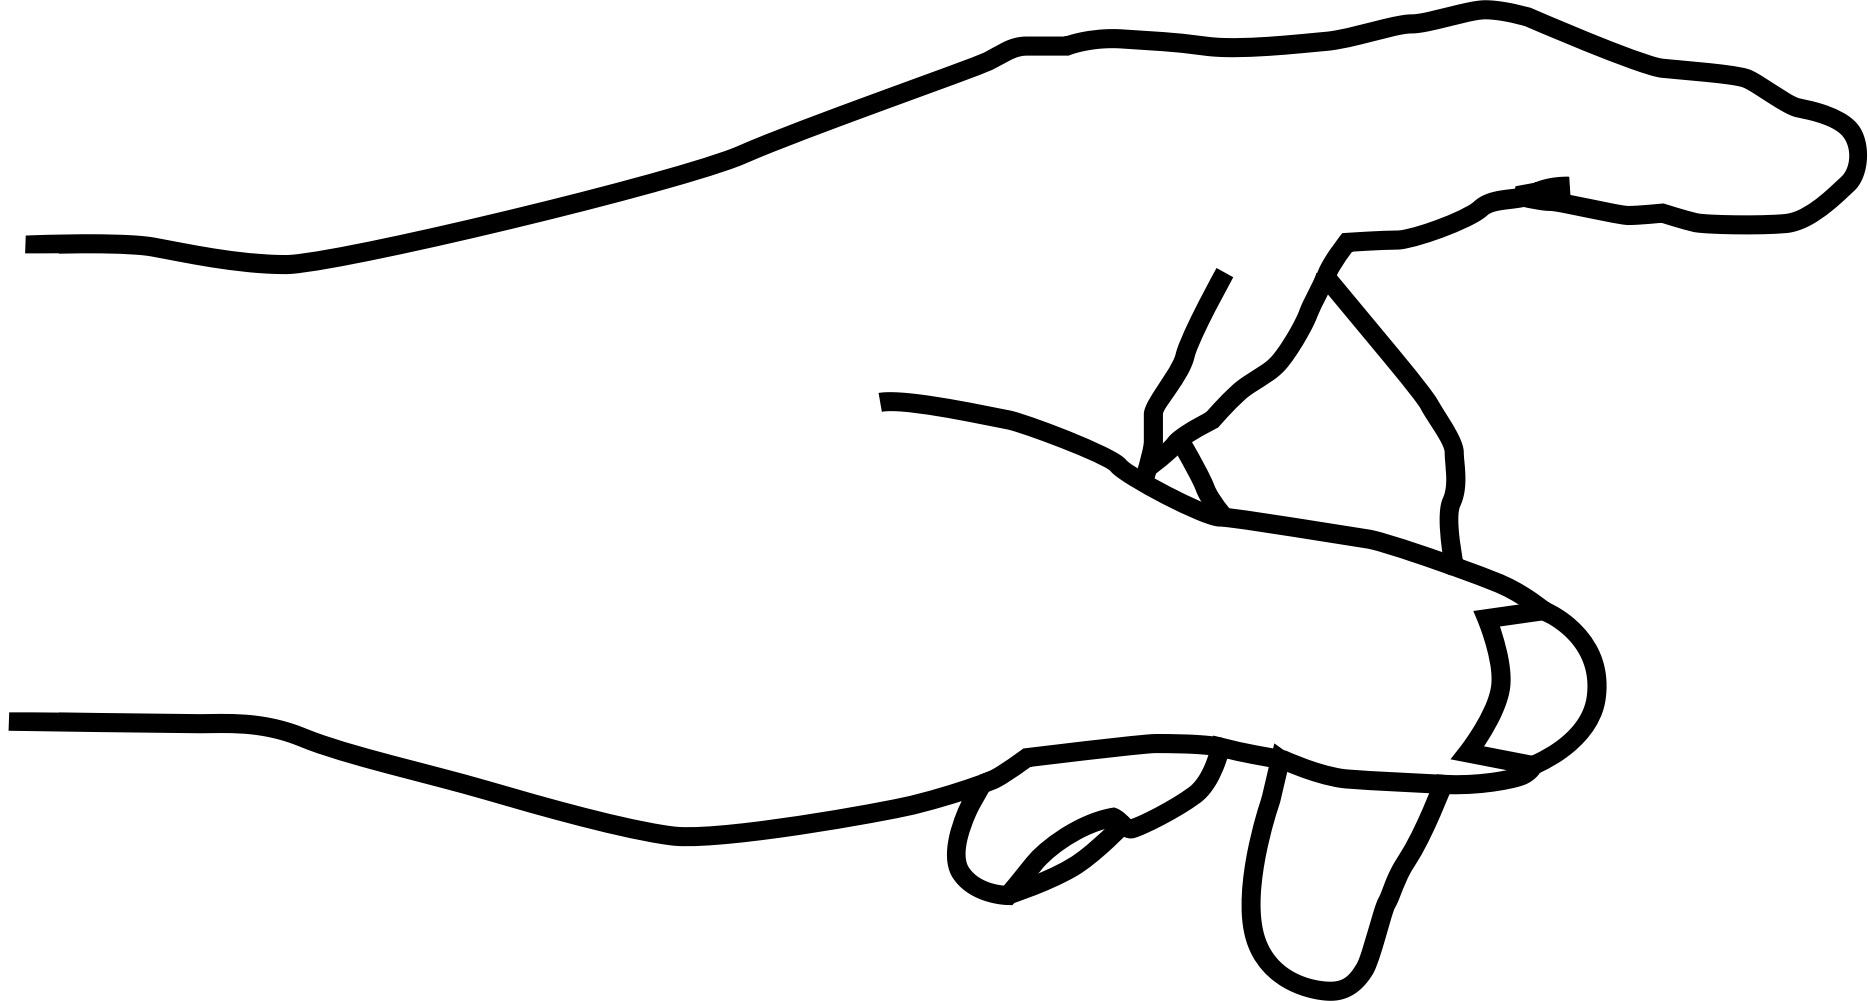 Lines clipart hand Hand Finger Clipart Hand Finger